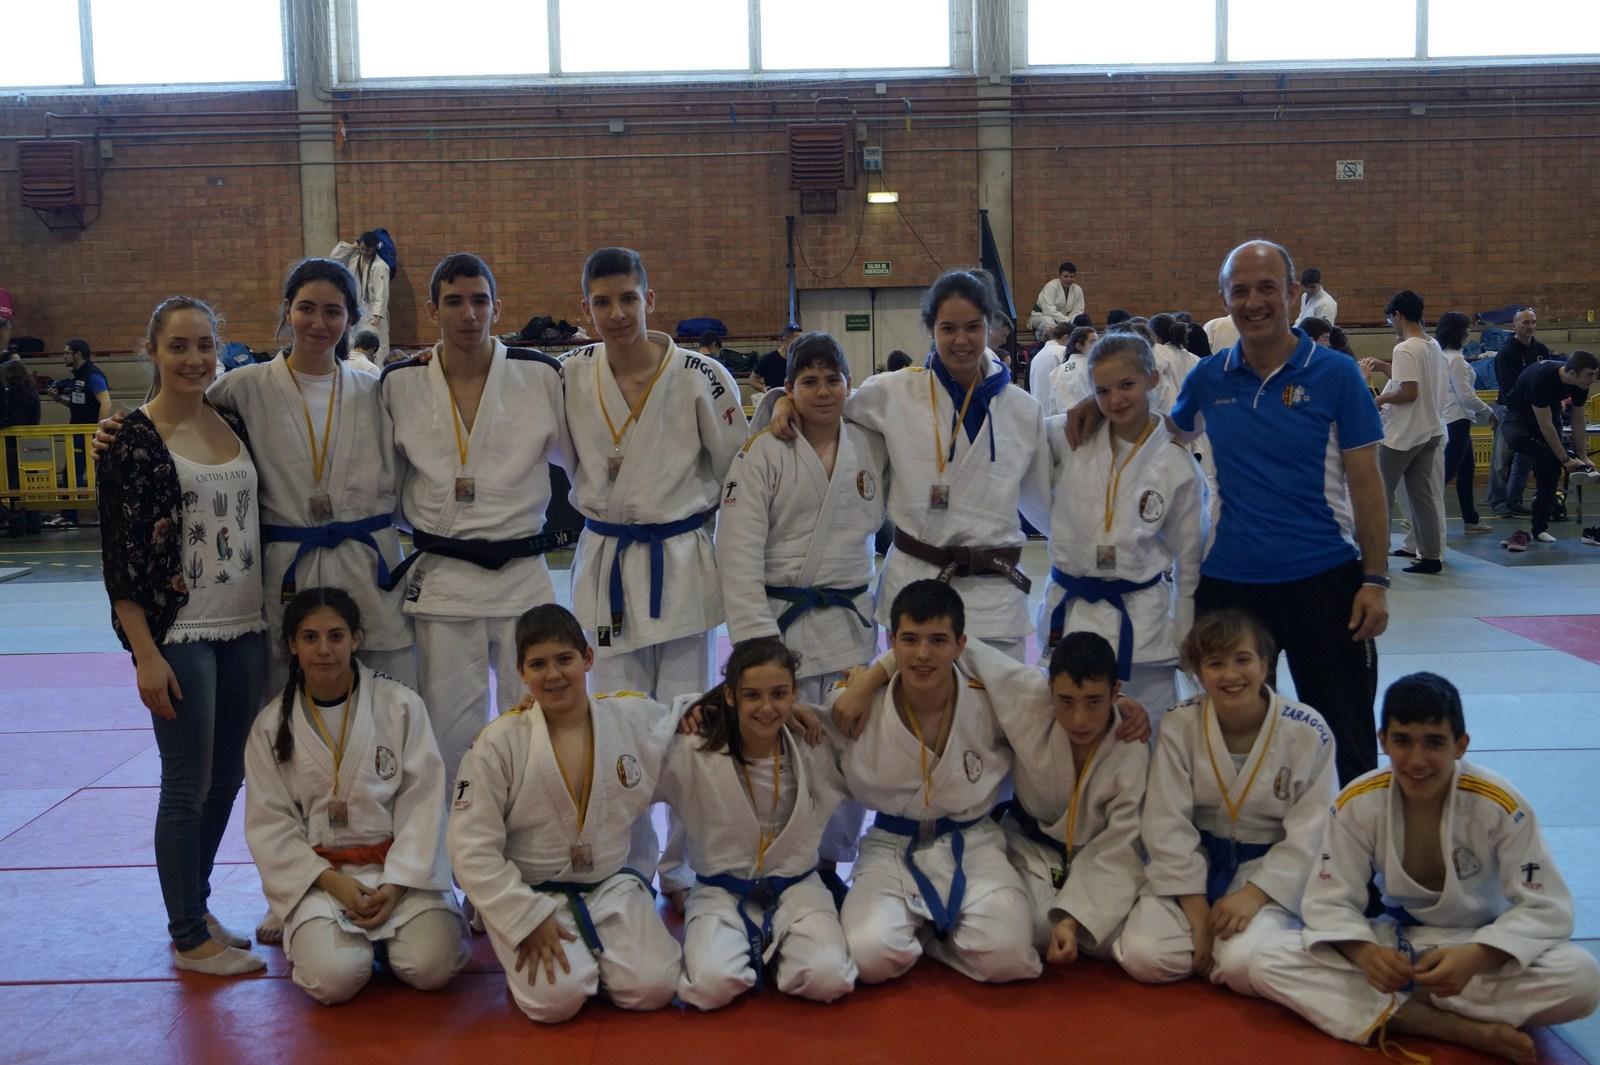 2º Fase Cto. de Aragón Infantil-Cadete 17/04/16